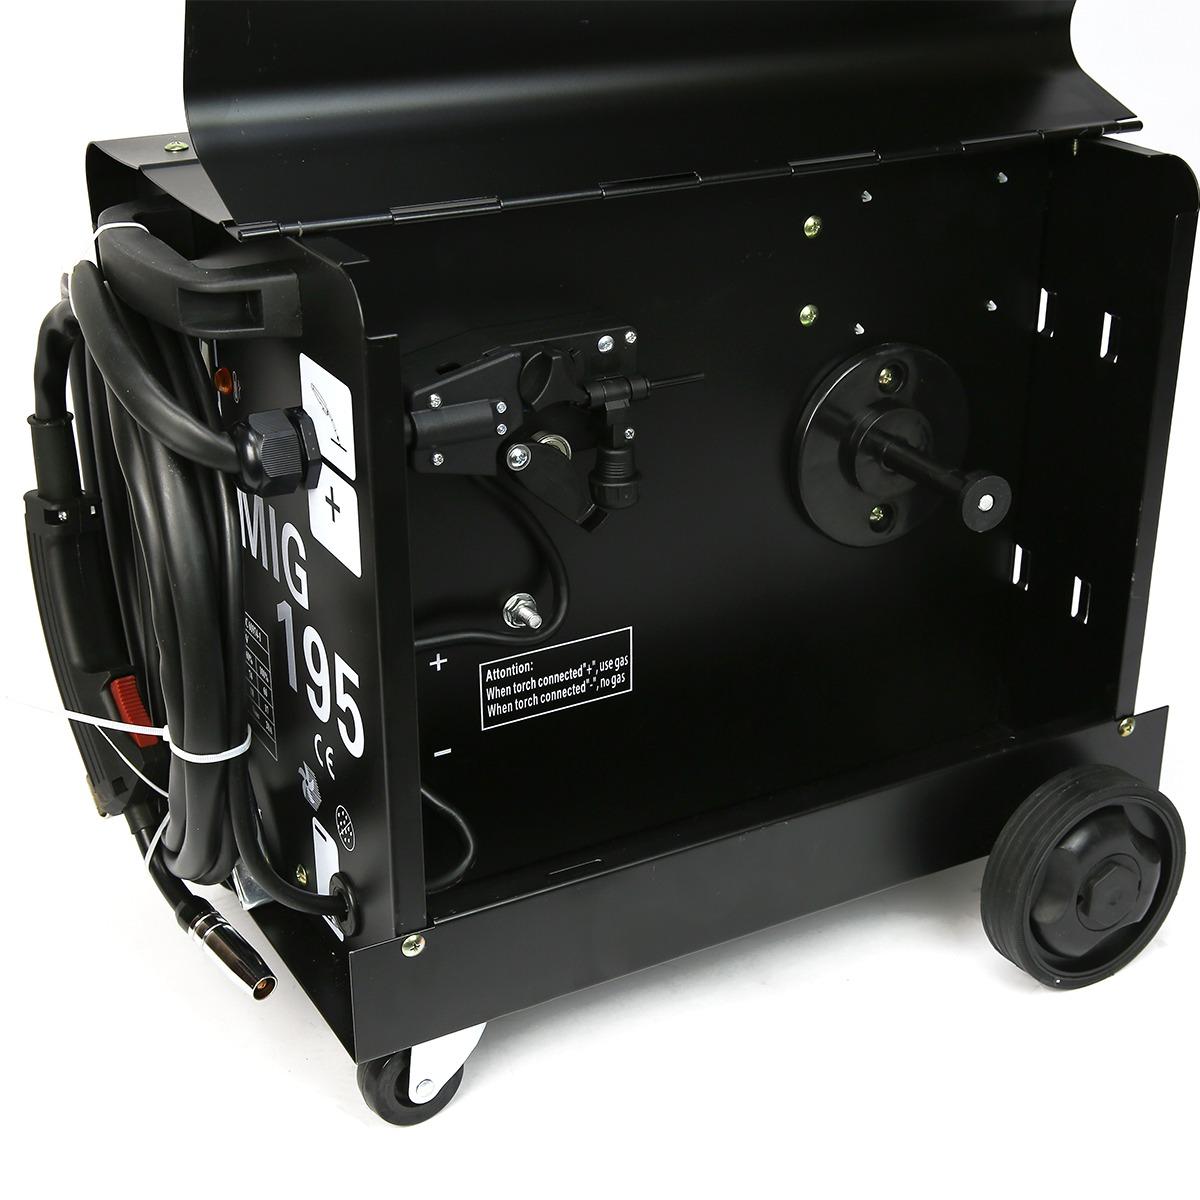 195 Amp Dual Mig 230v Flux Core Auto Wire Welding Machine Gas No Welder Parts Cored With